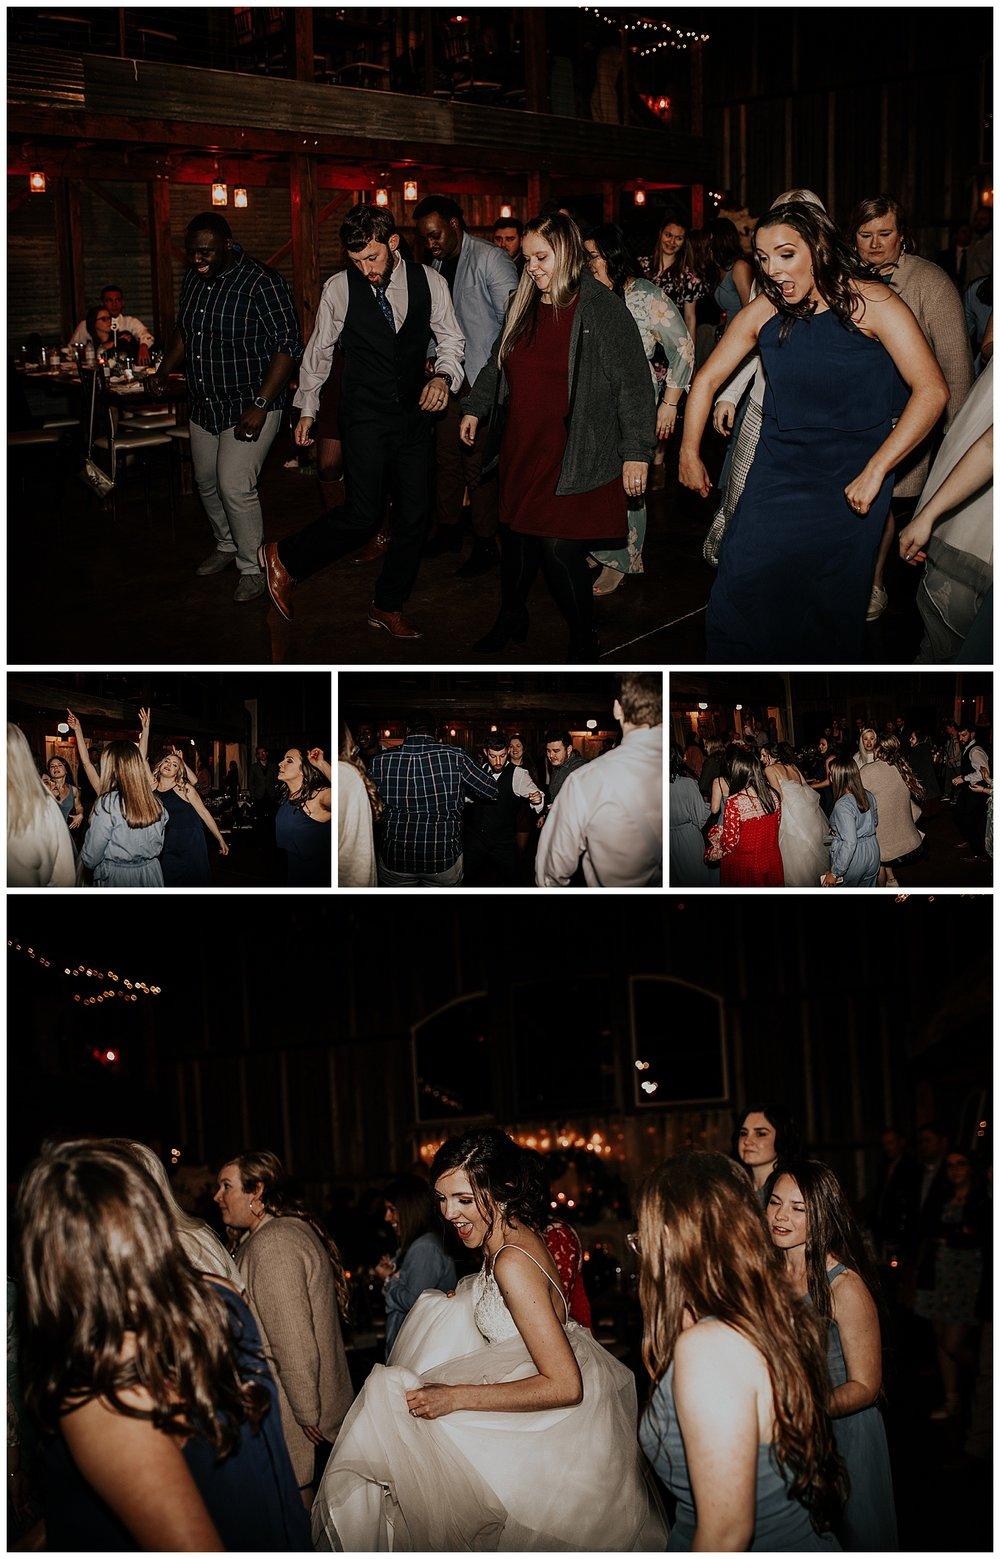 Laken-Mackenzie-Photography-Burge-Wedding-Stillwater-Meadow-Aledo-Texas-Dallas-Fort-Worth-Wedding-Photographer23.jpg